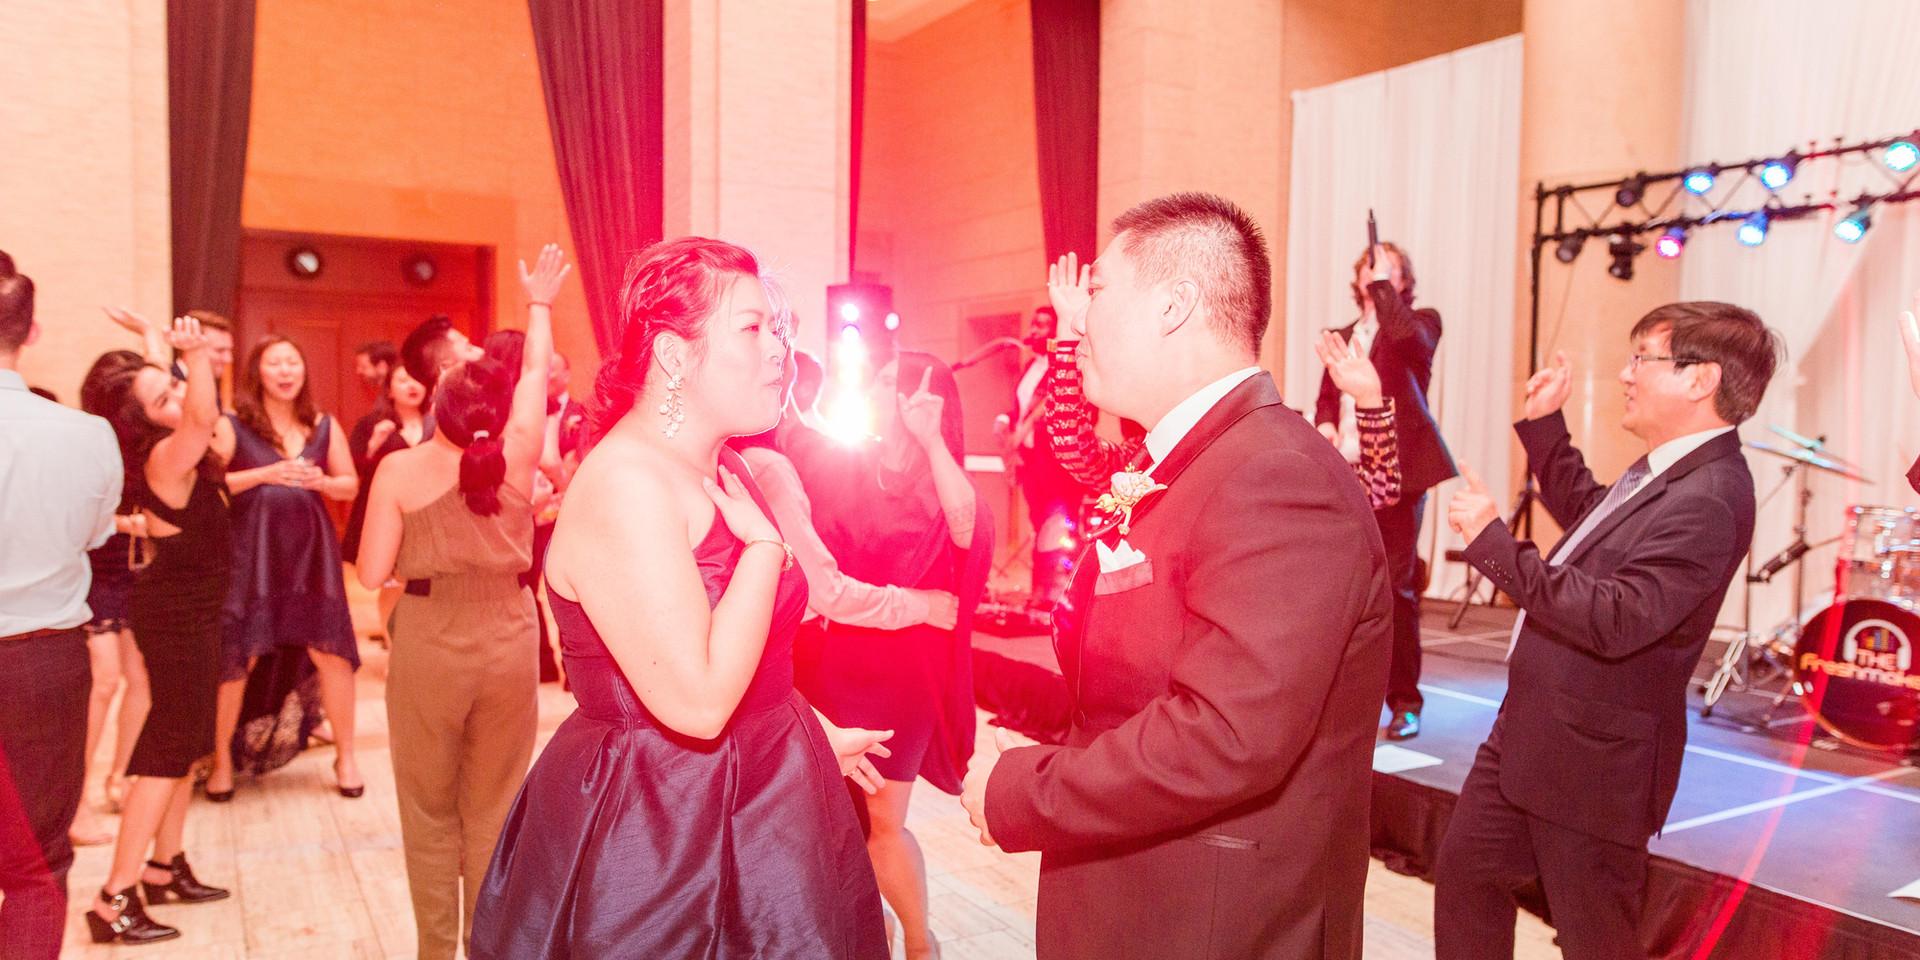 Marina-Eugene-Wedding-by-JBJ-Pictures-48